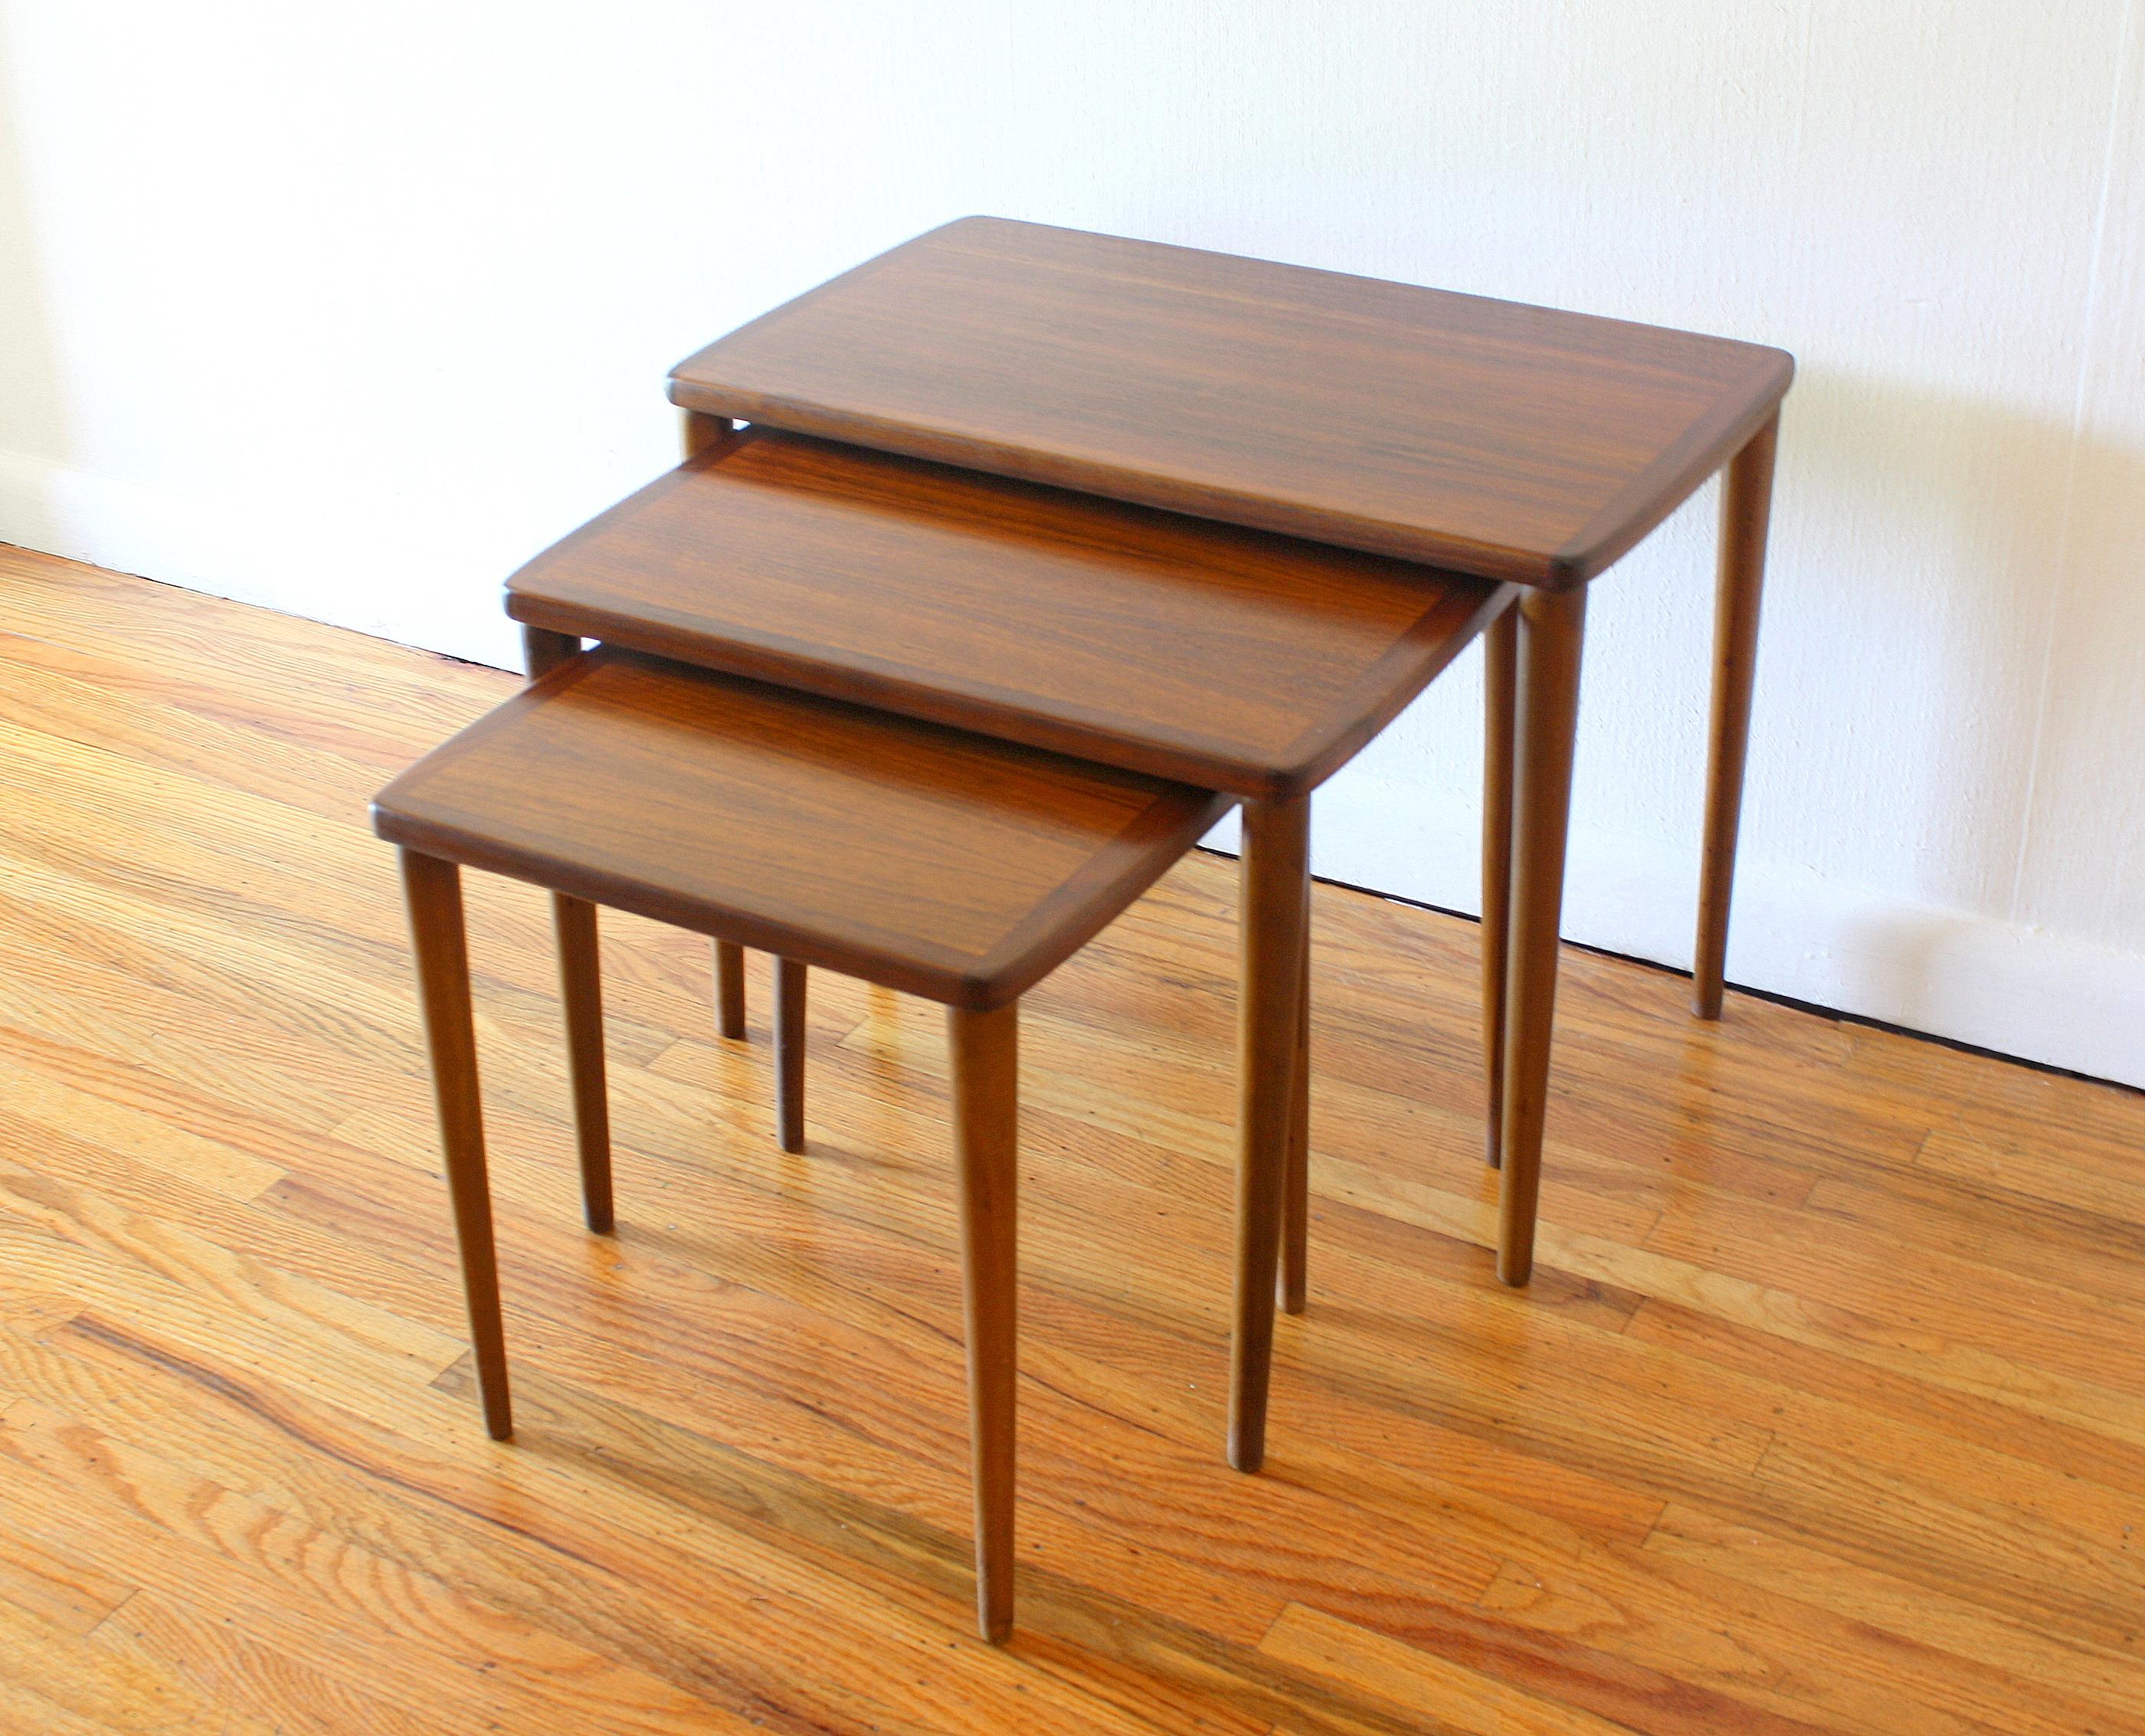 mcm nesting tables 1.JPG